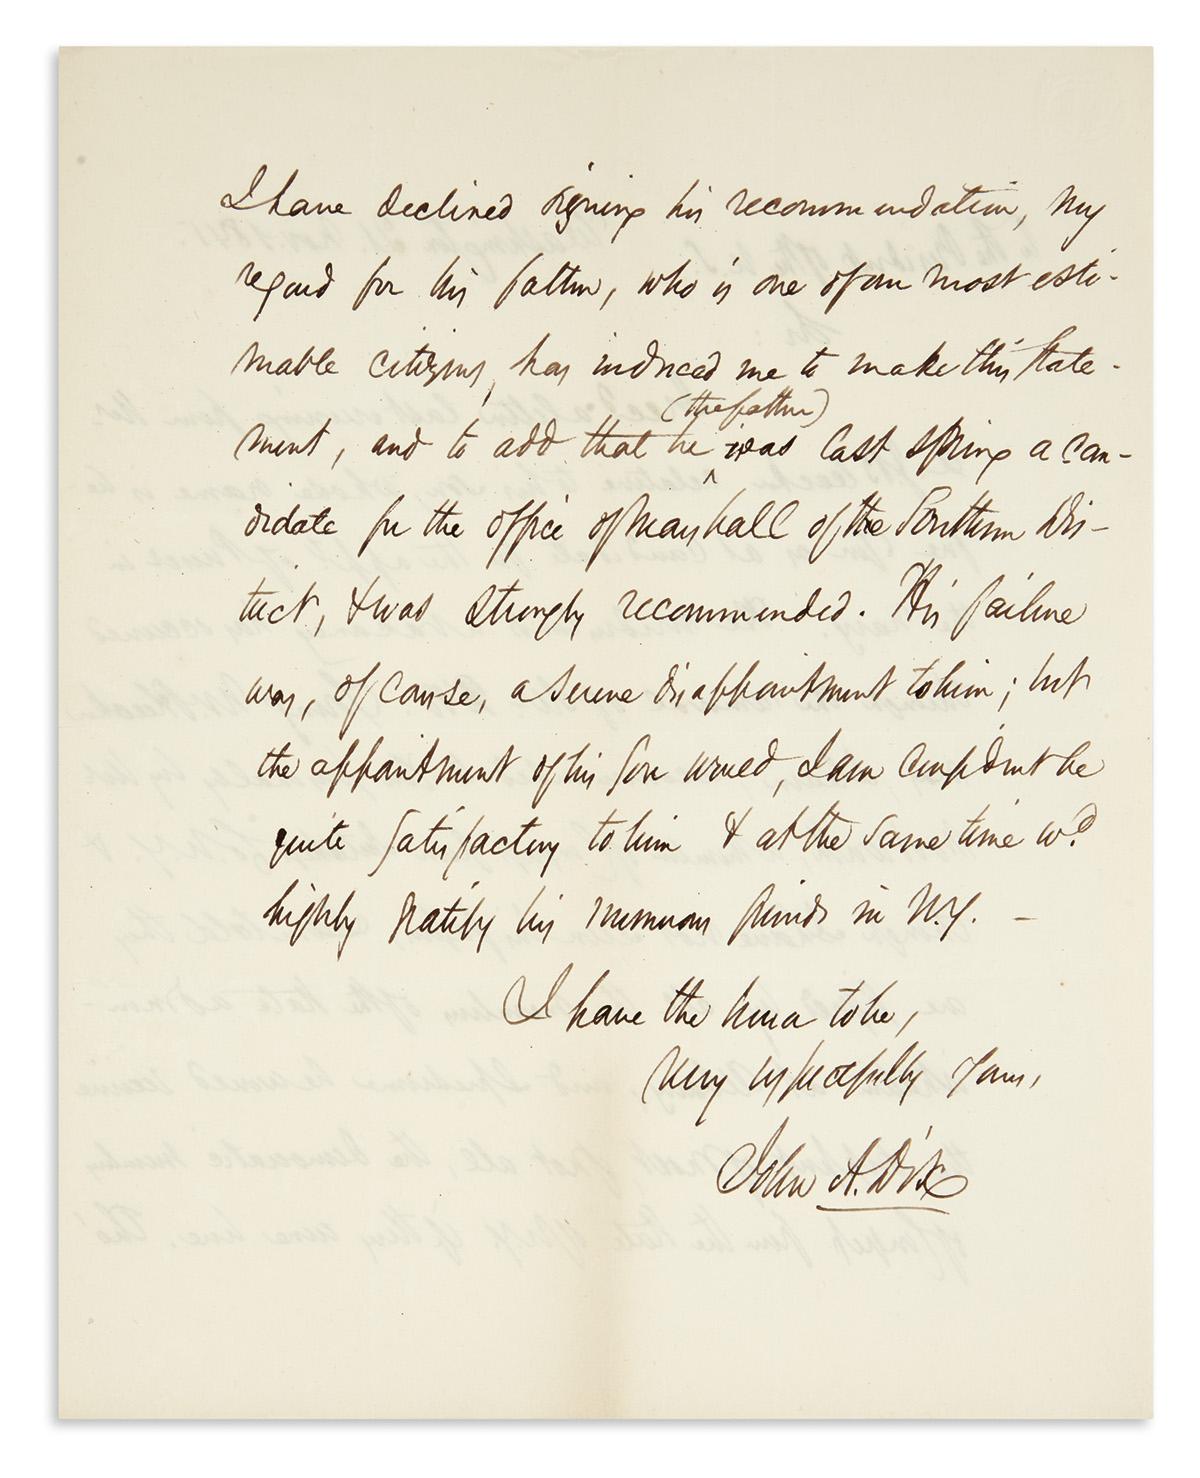 DIX-JOHN-A-Autograph-Letter-Signed-as-Senator-to-President-J